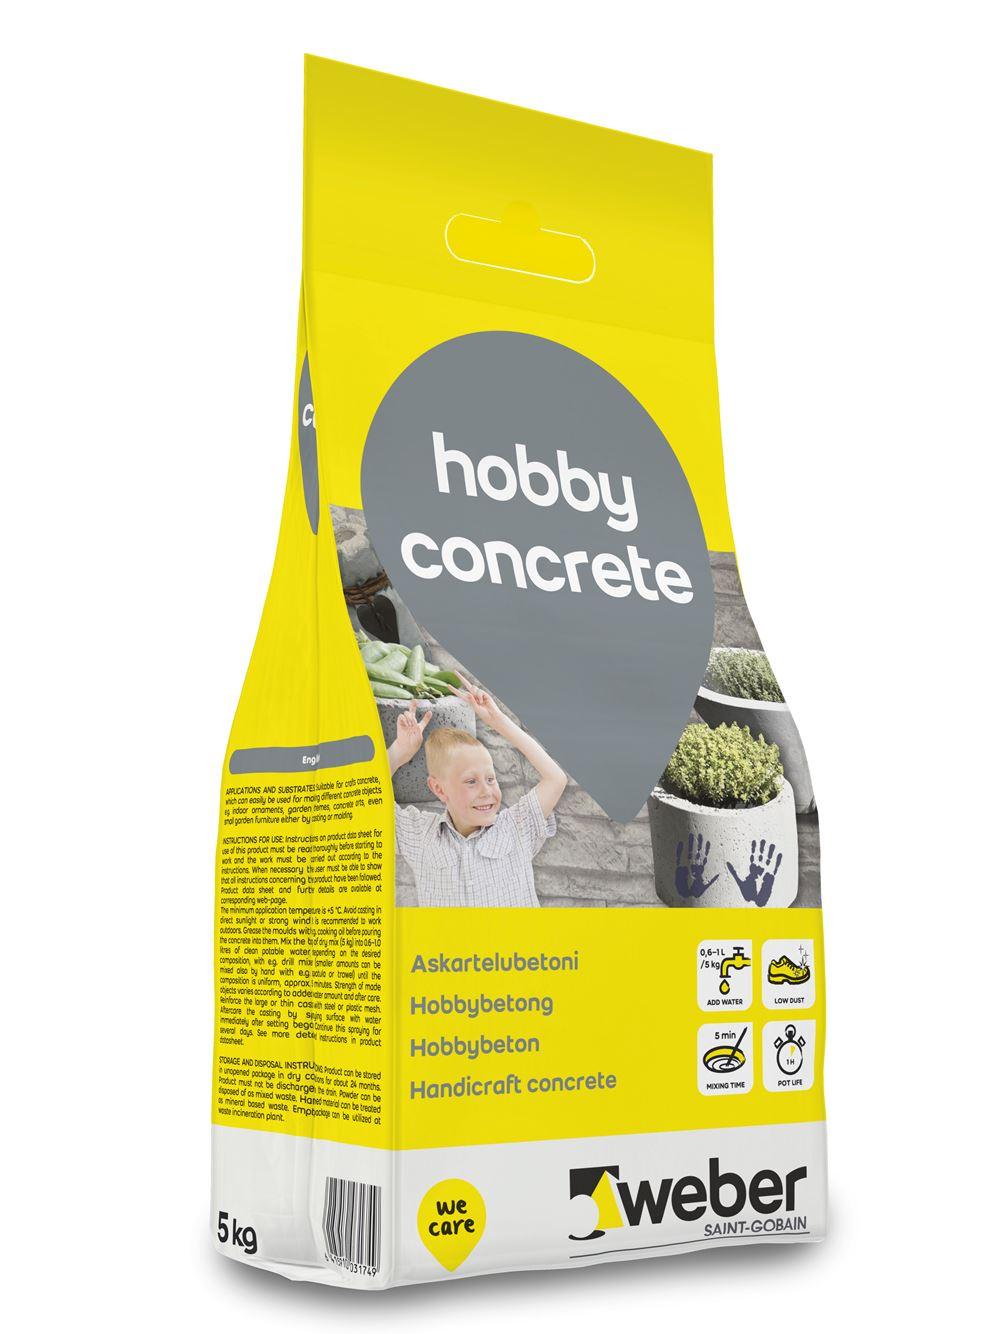 hobbyconcrete_5kg